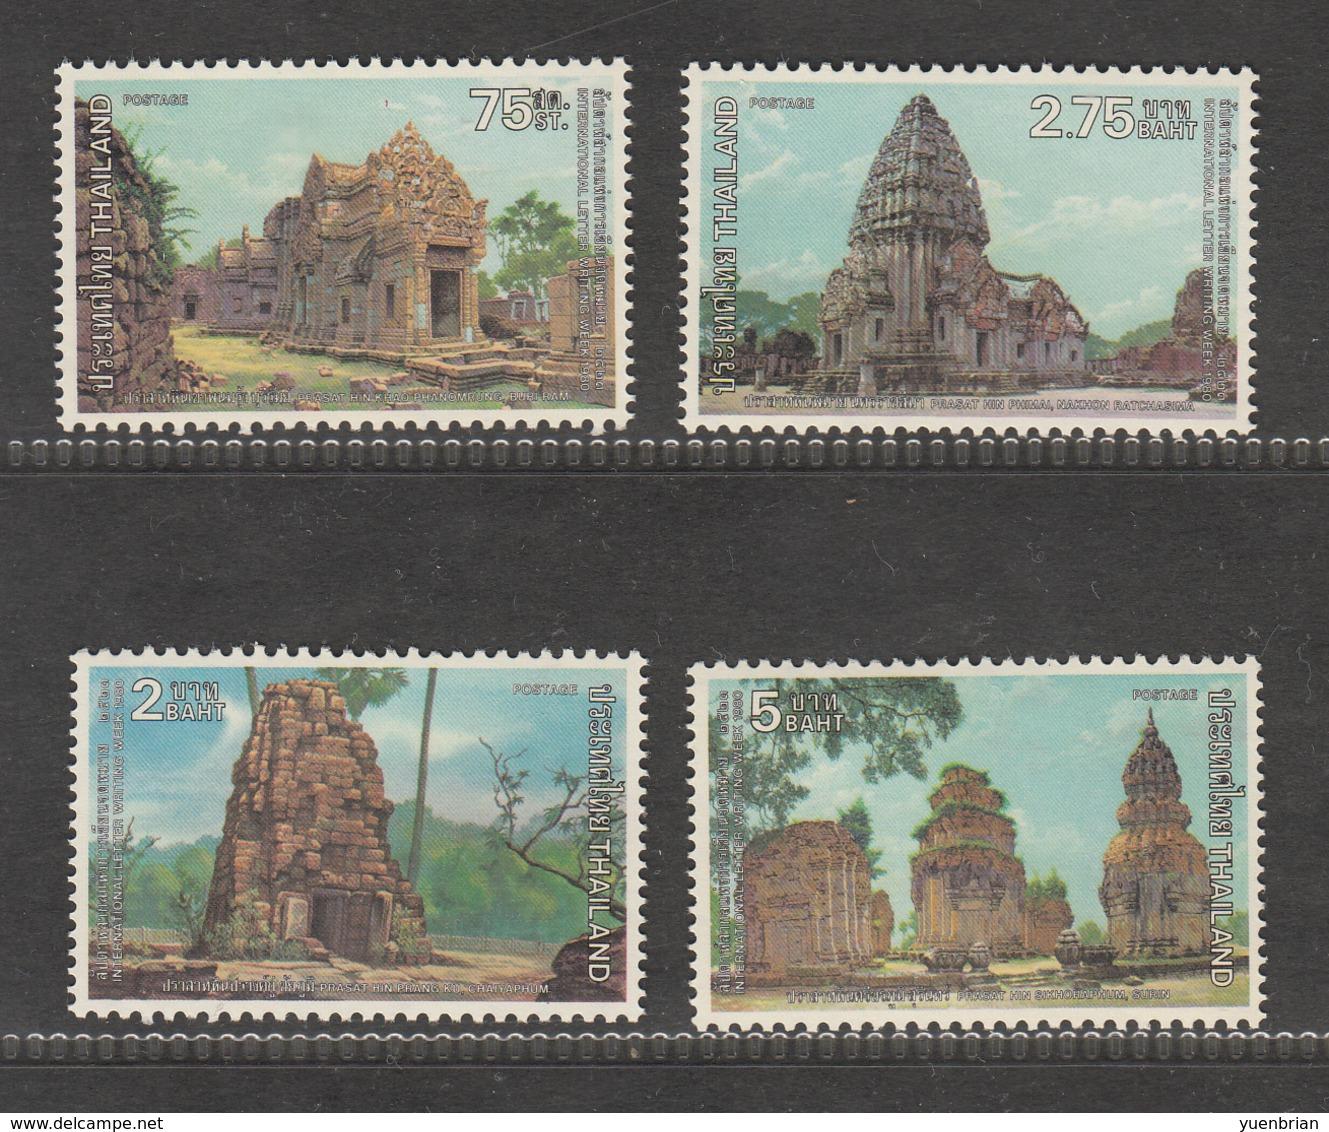 Thailand 1980, International Letter Writing Week, Set Of 4v, MNH** - Thailand